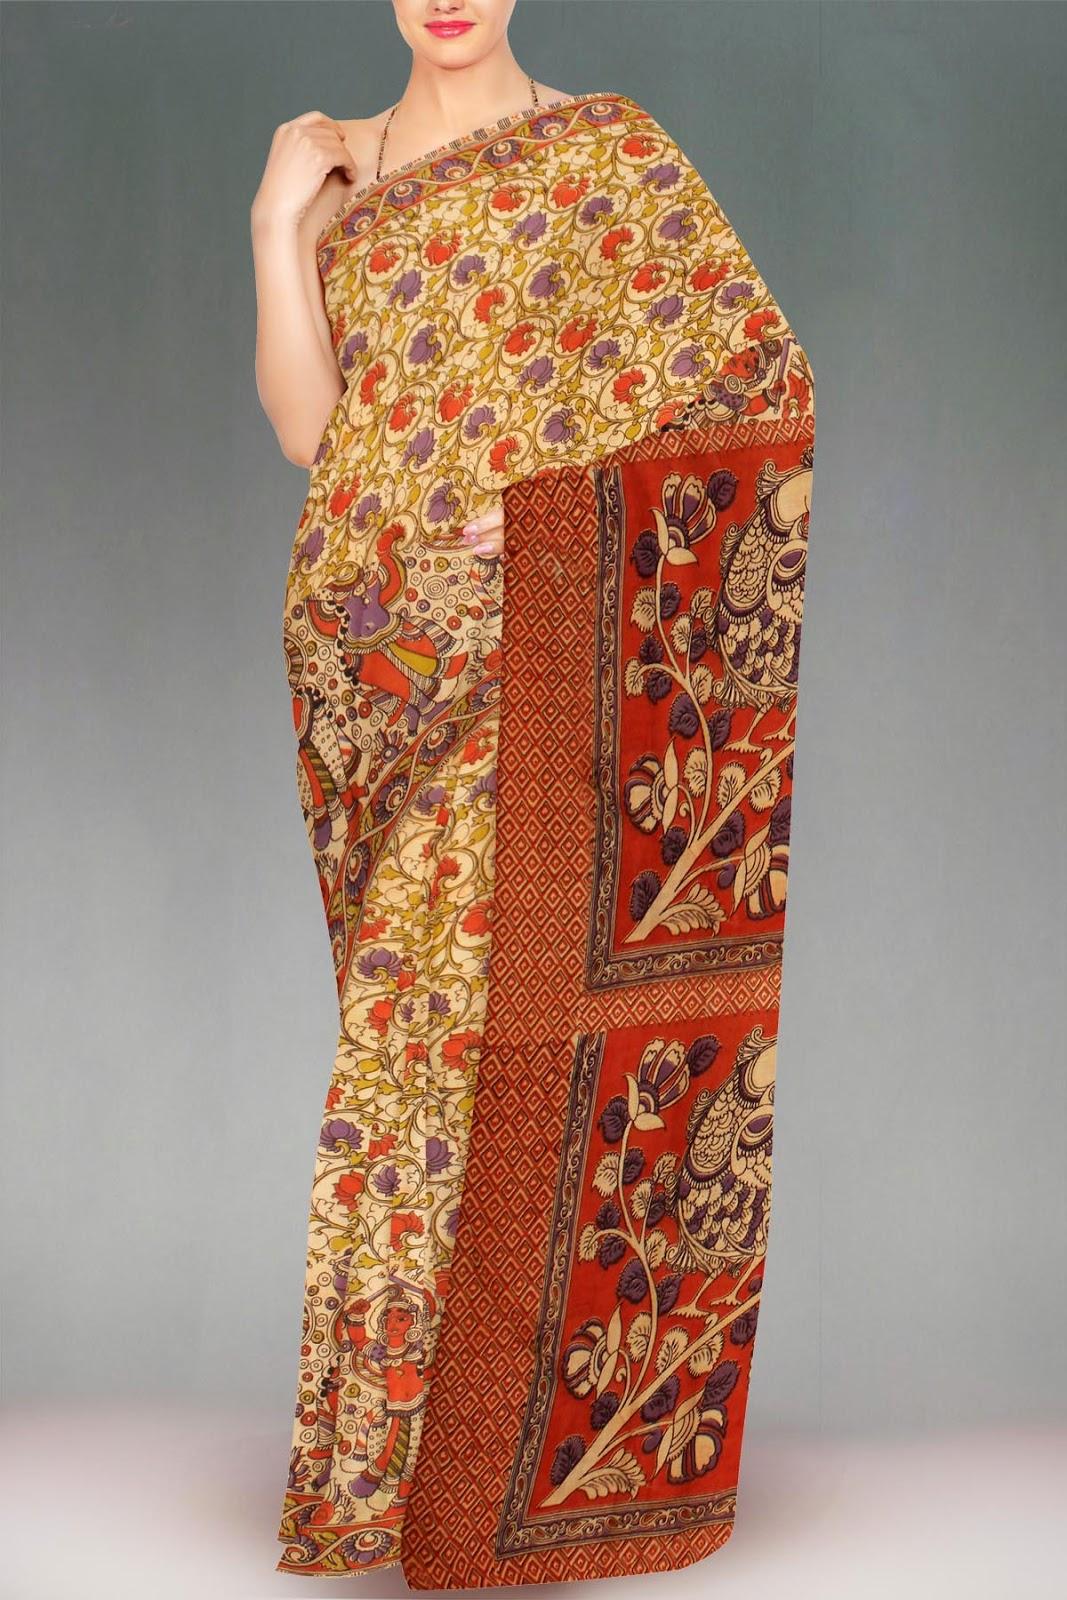 571282e79218b Kalamkari – life-like depictions on fine handloom sarees.